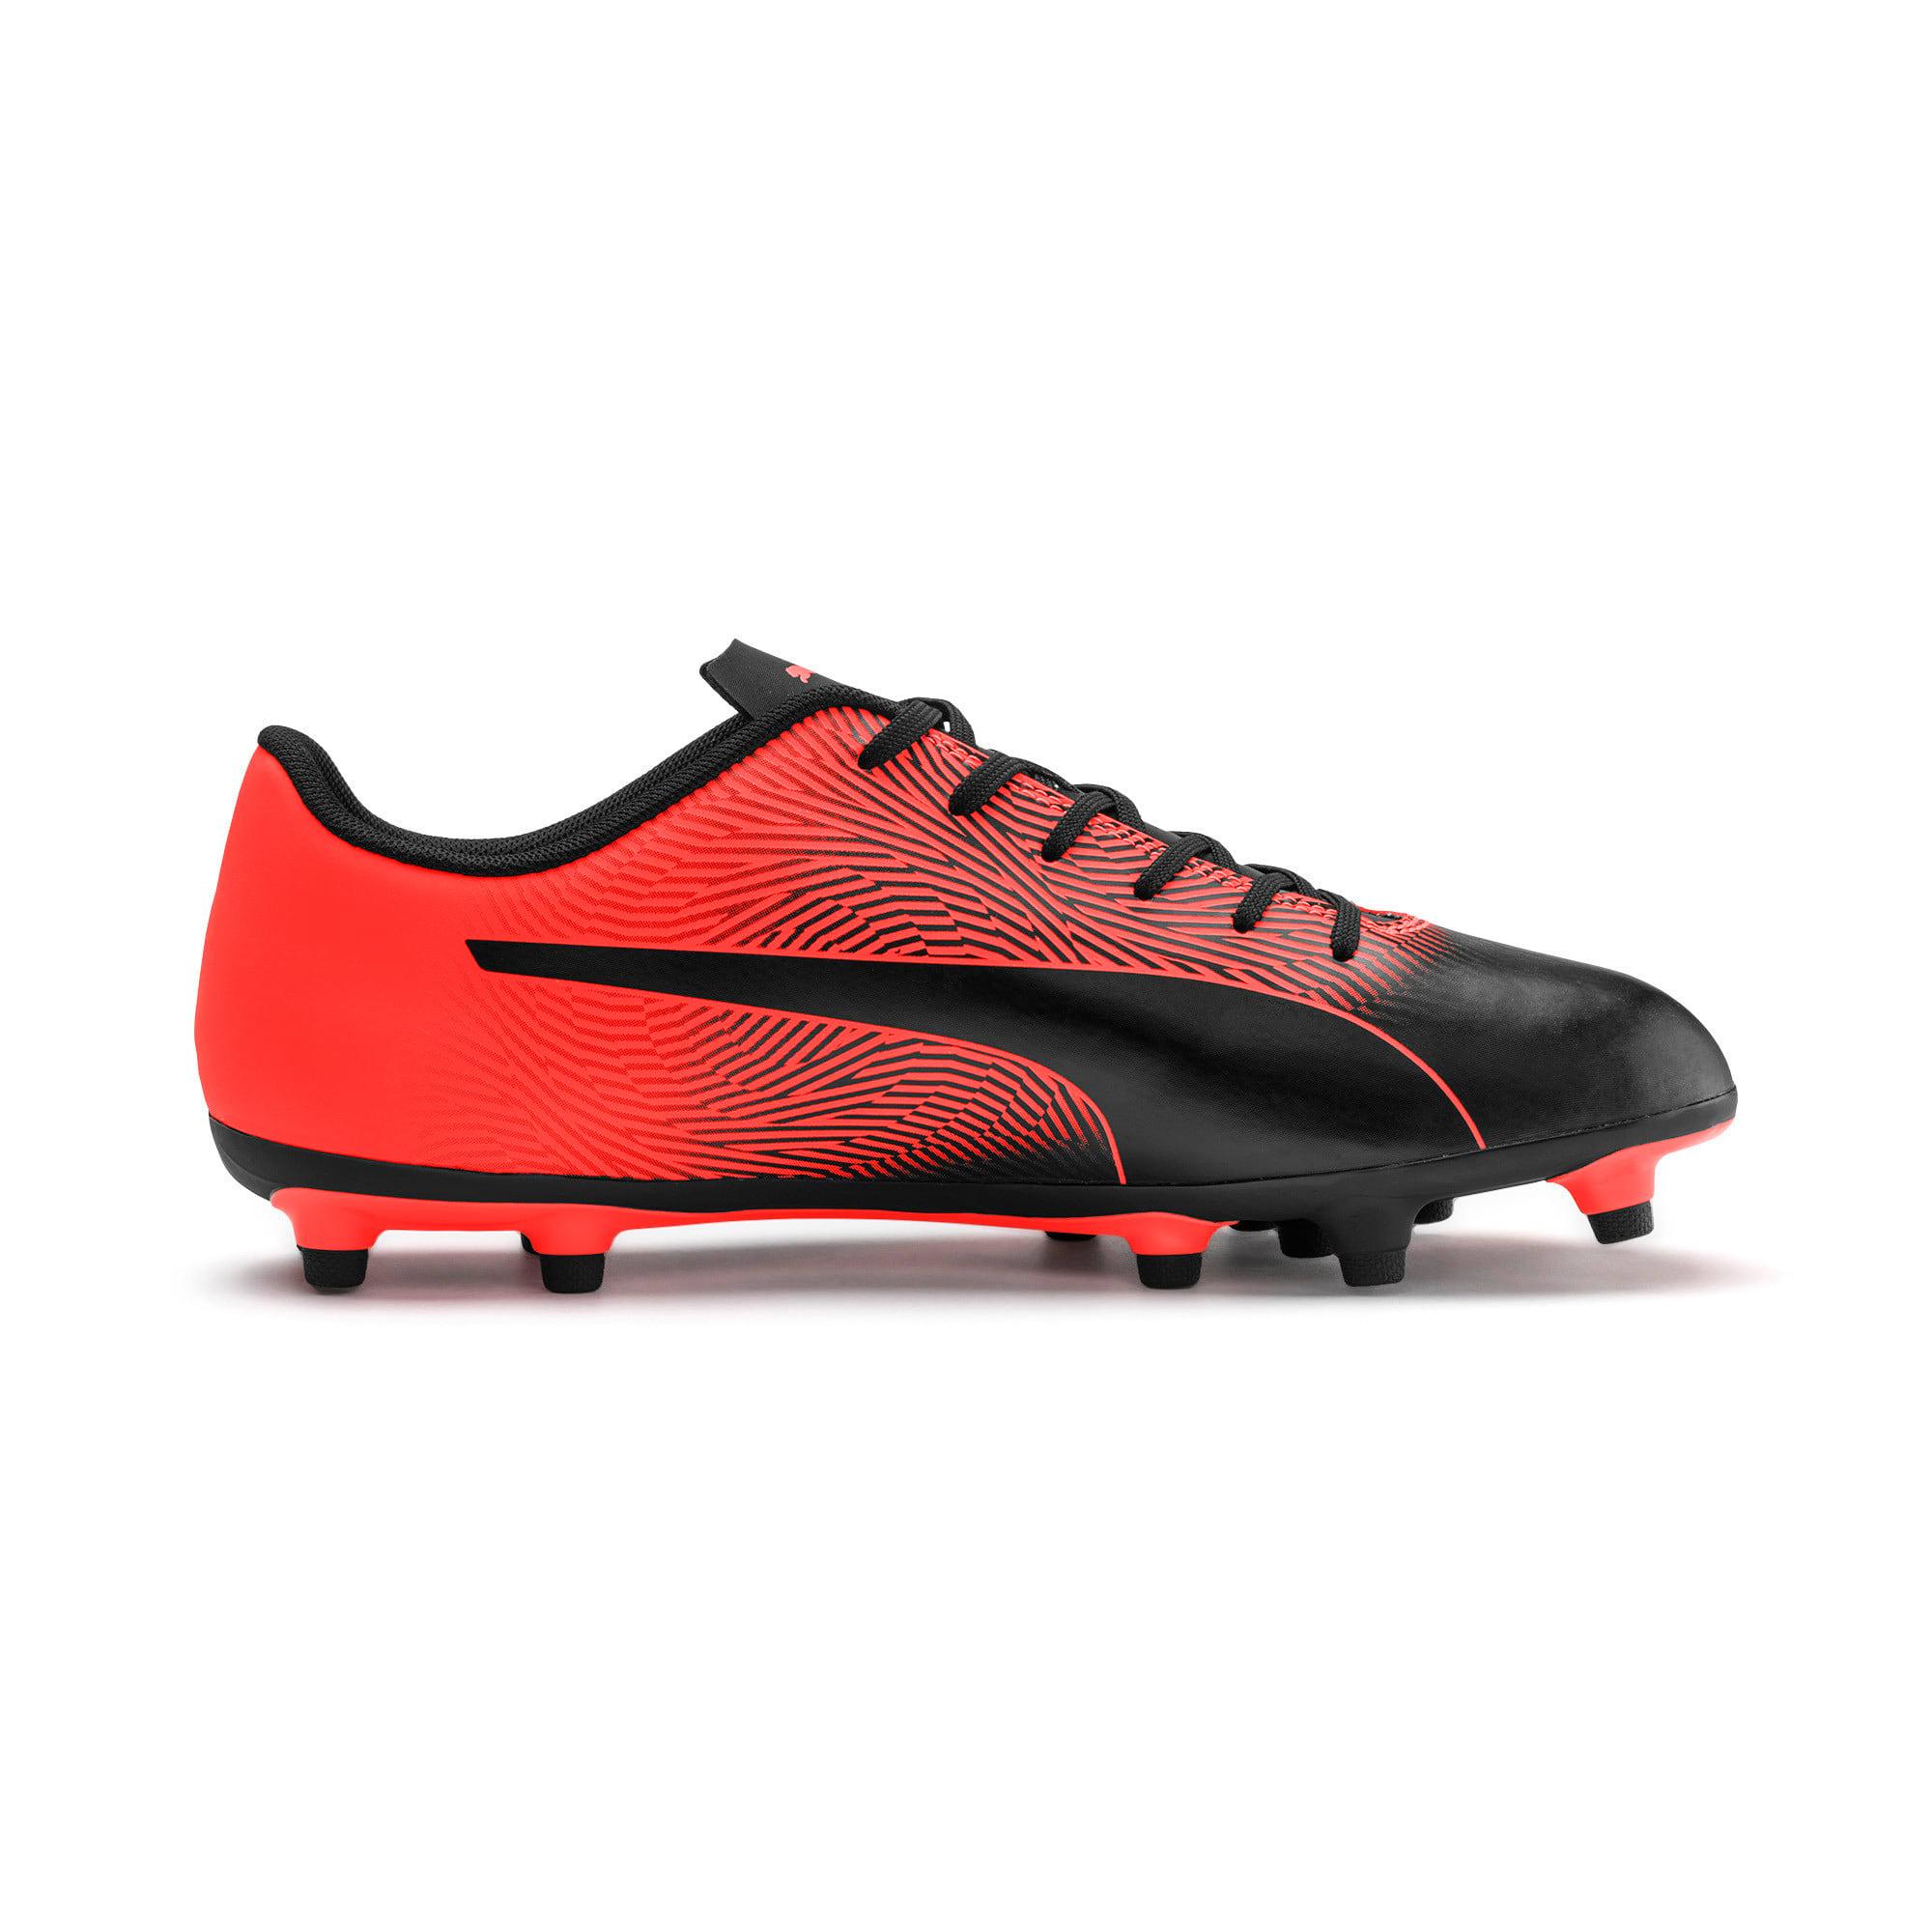 Thumbnail 7 of PUMA Spirit II FG Men's Football Boots, Puma Black-Nrgy Red, medium-IND